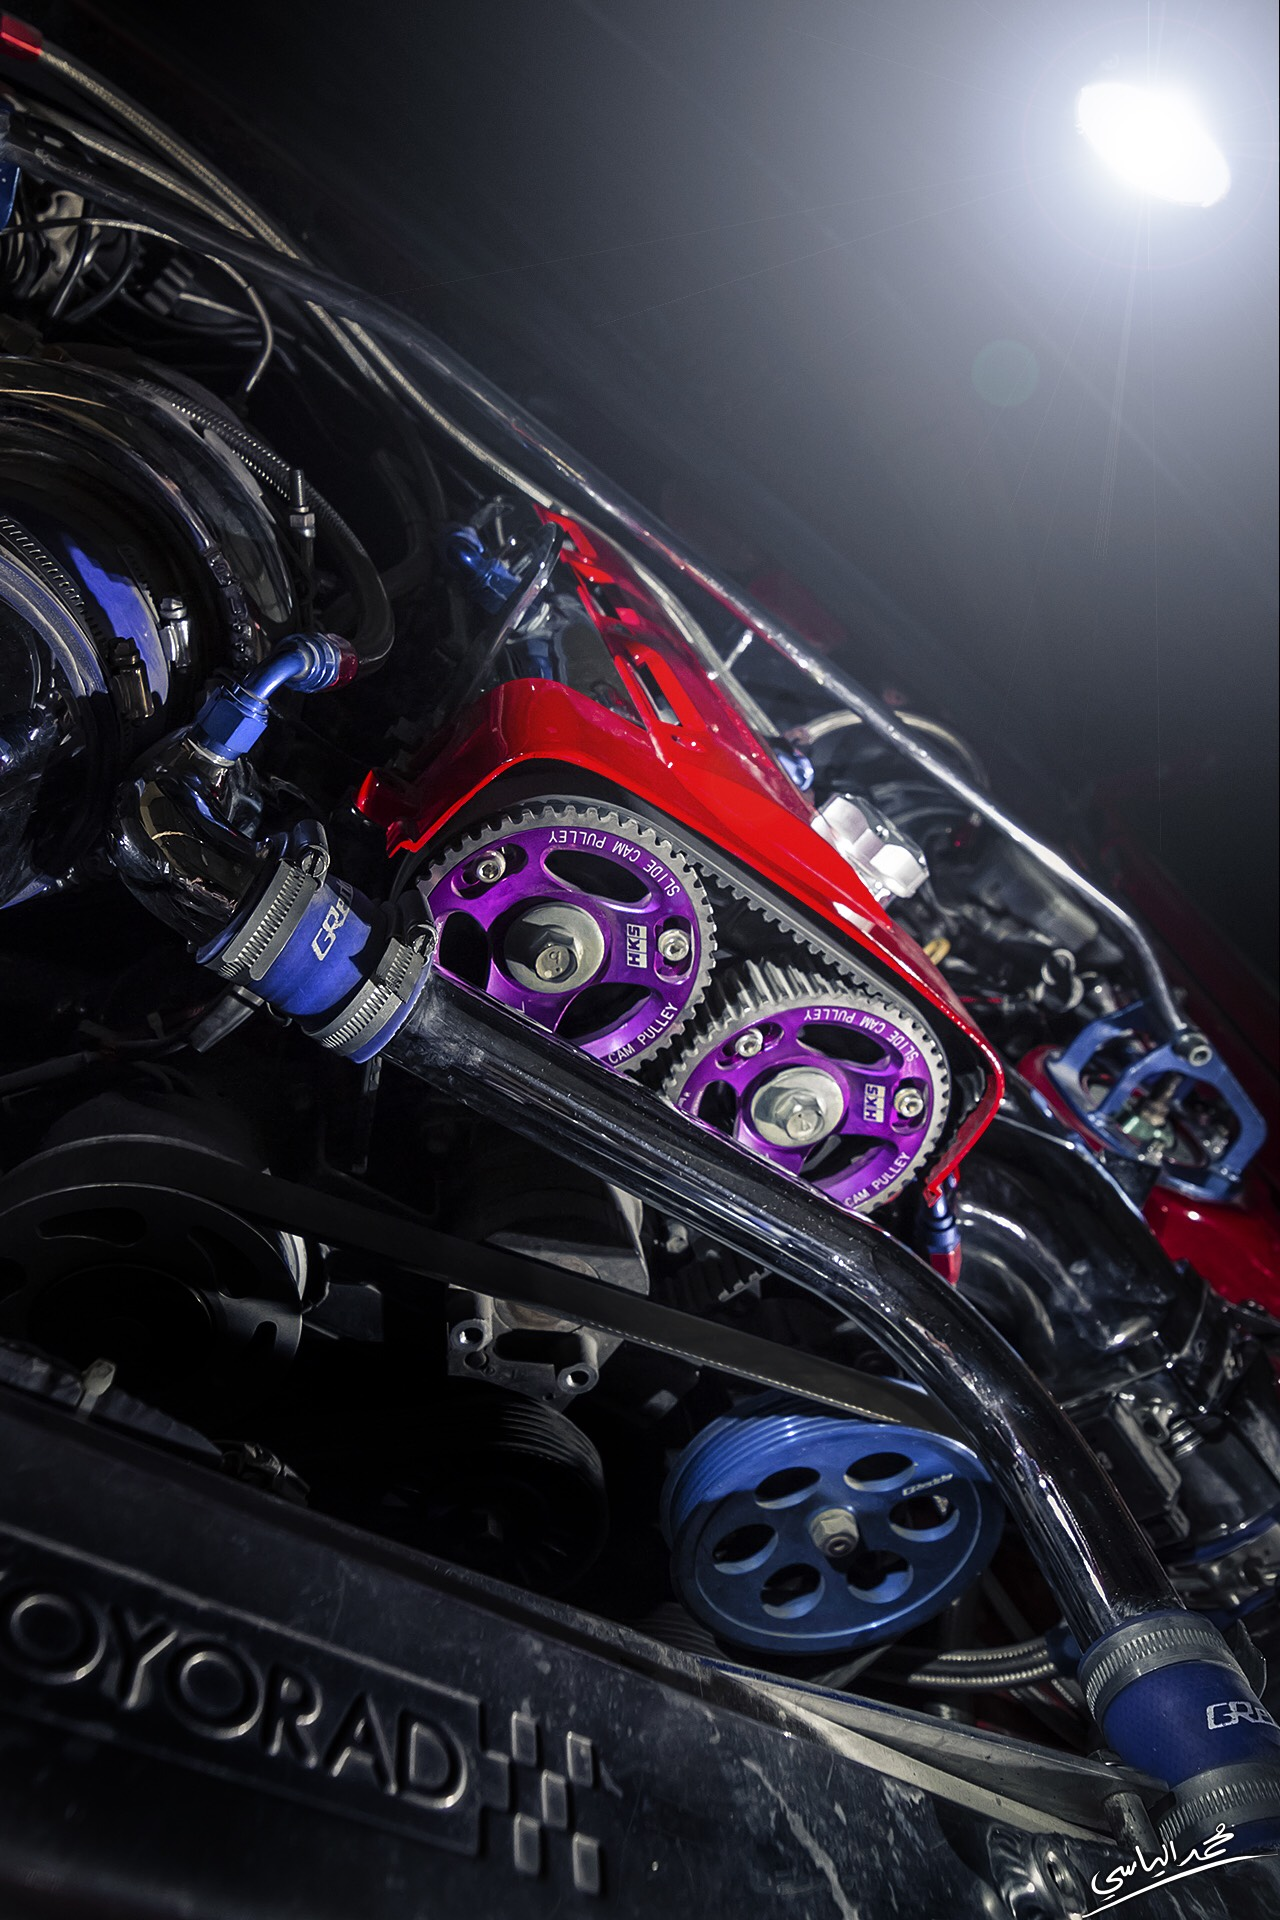 картинки двигатель авто на смартфон